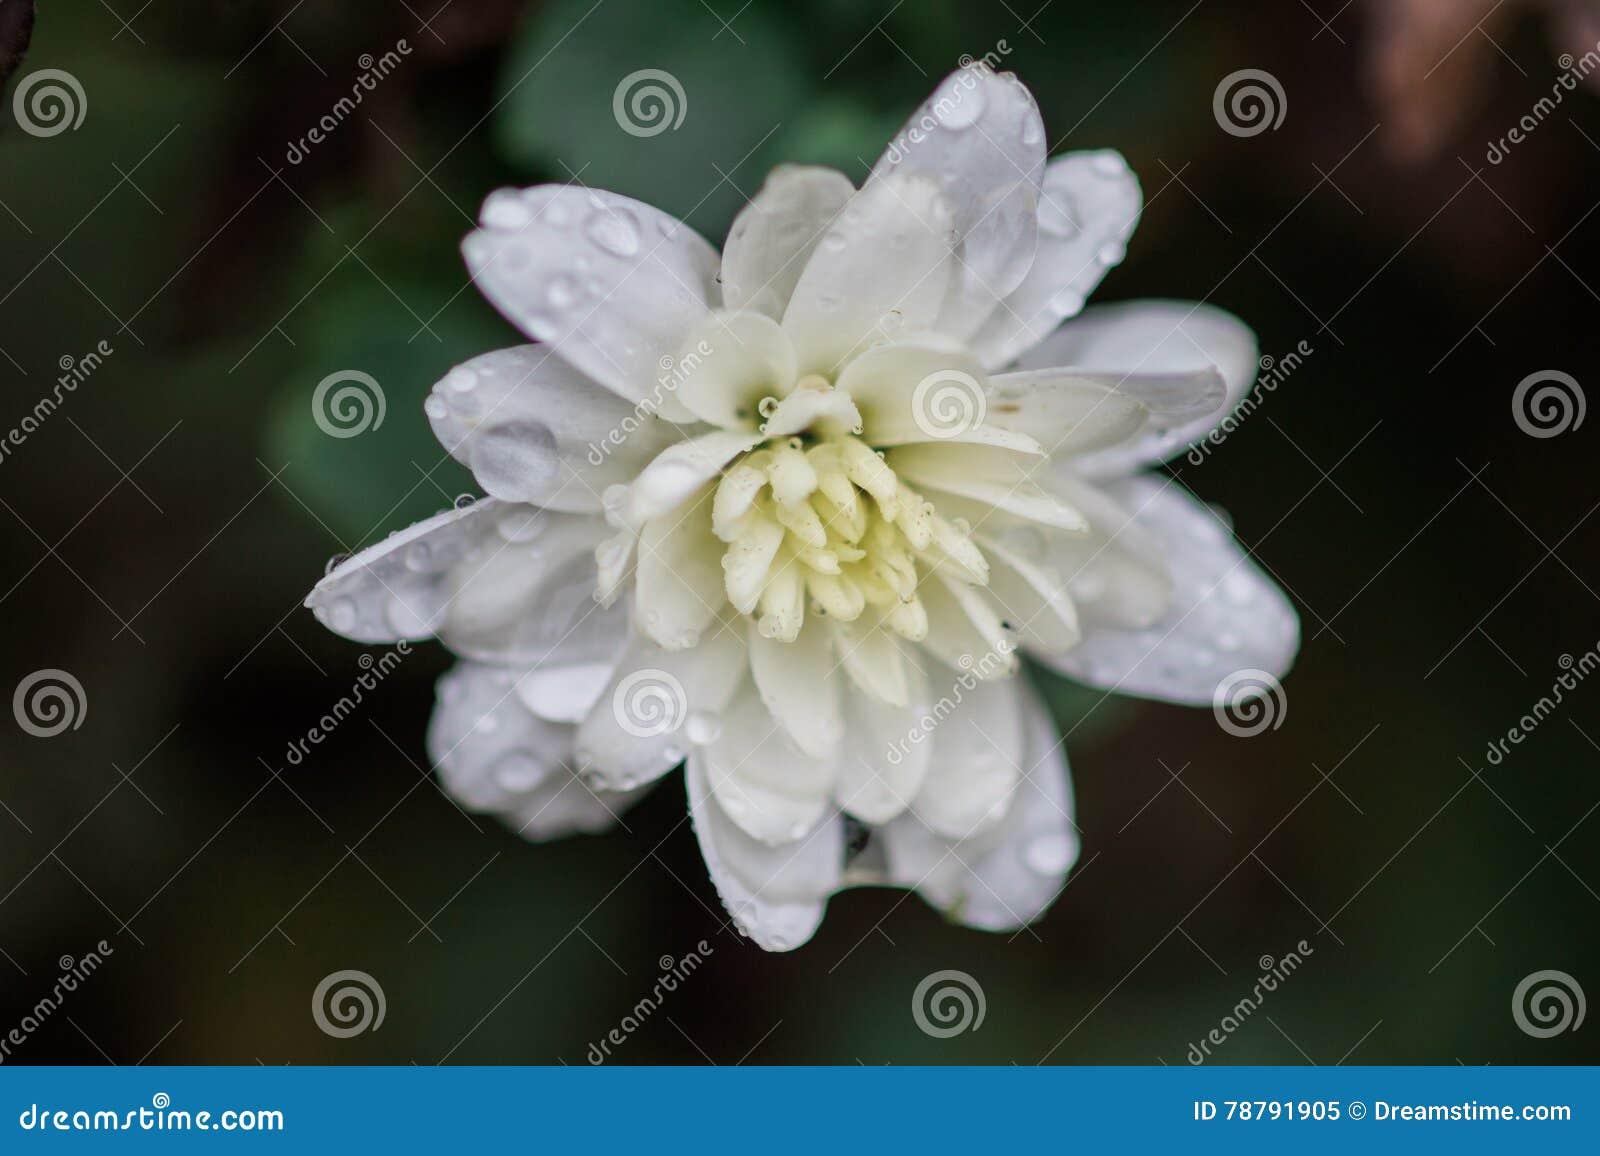 White Mum Stock Image Image Of Mums Annual Gardening 78791905